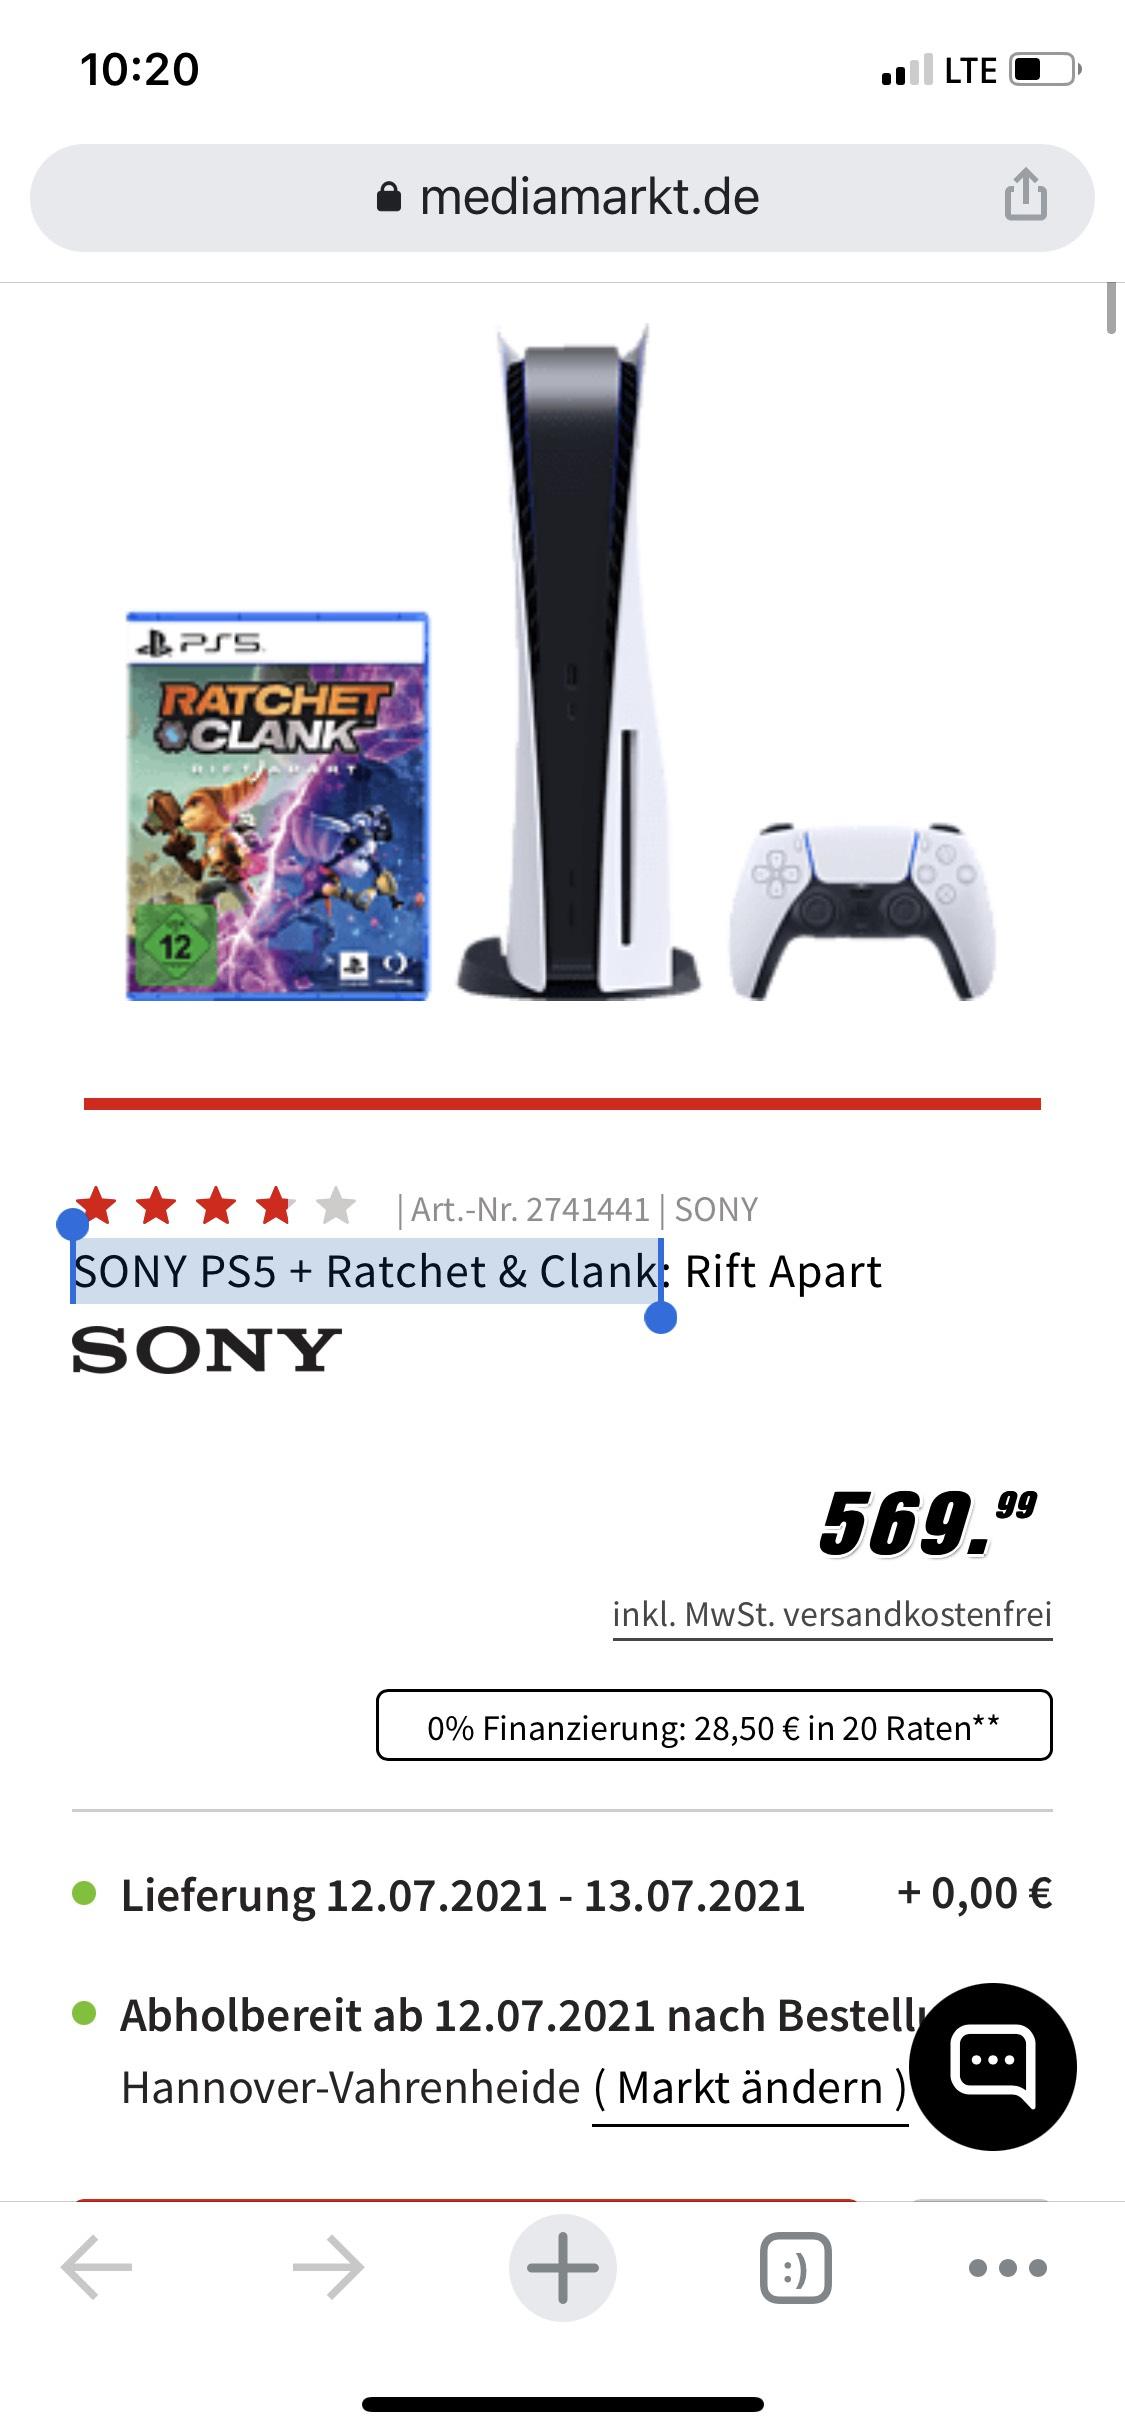 SONY PS5 + Ratchet & Clank PlayStation 5